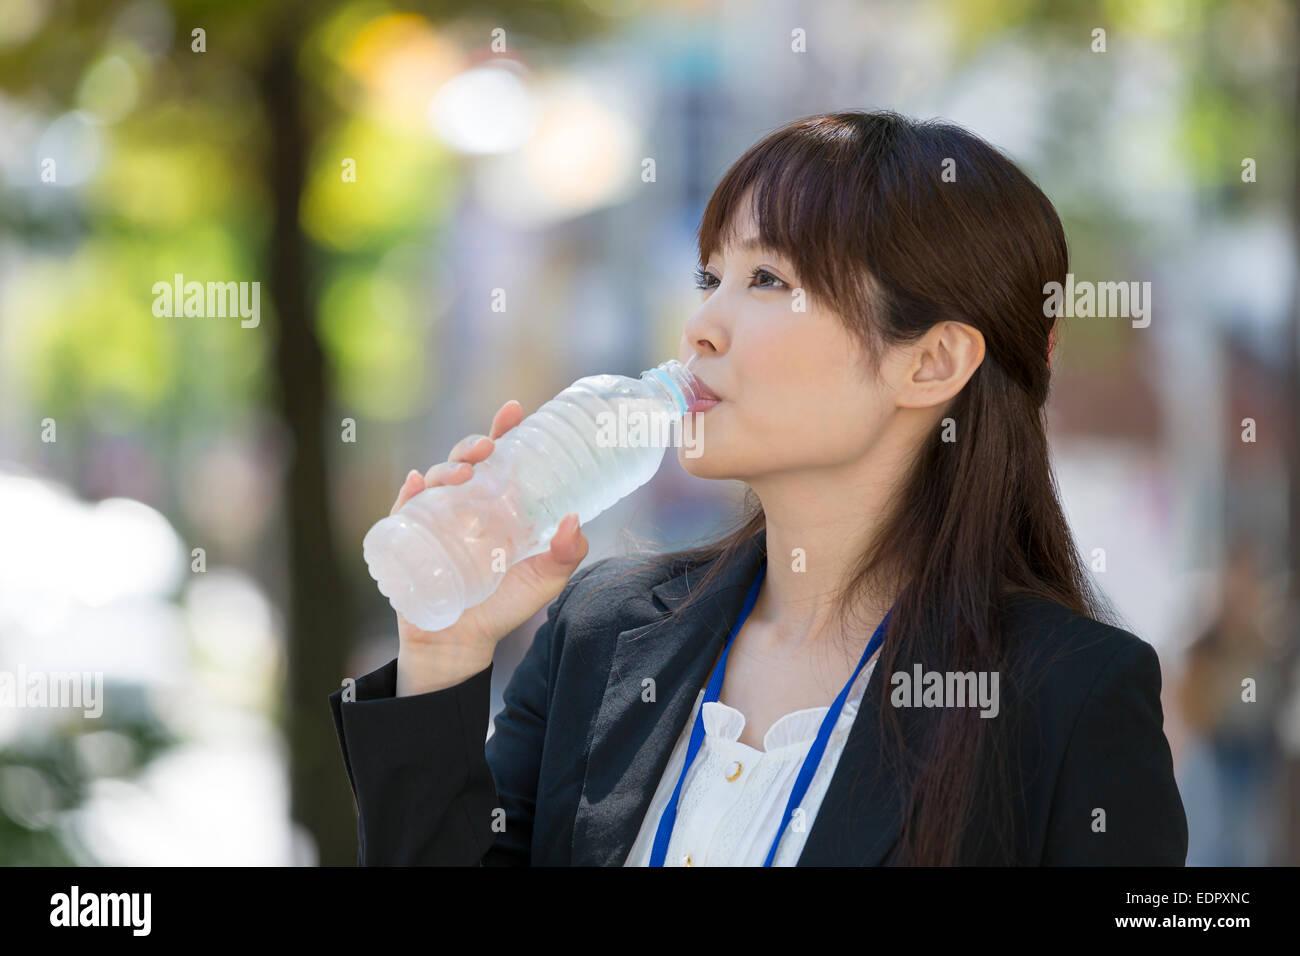 Businesswoman Drinking Bottled Water - Stock Image